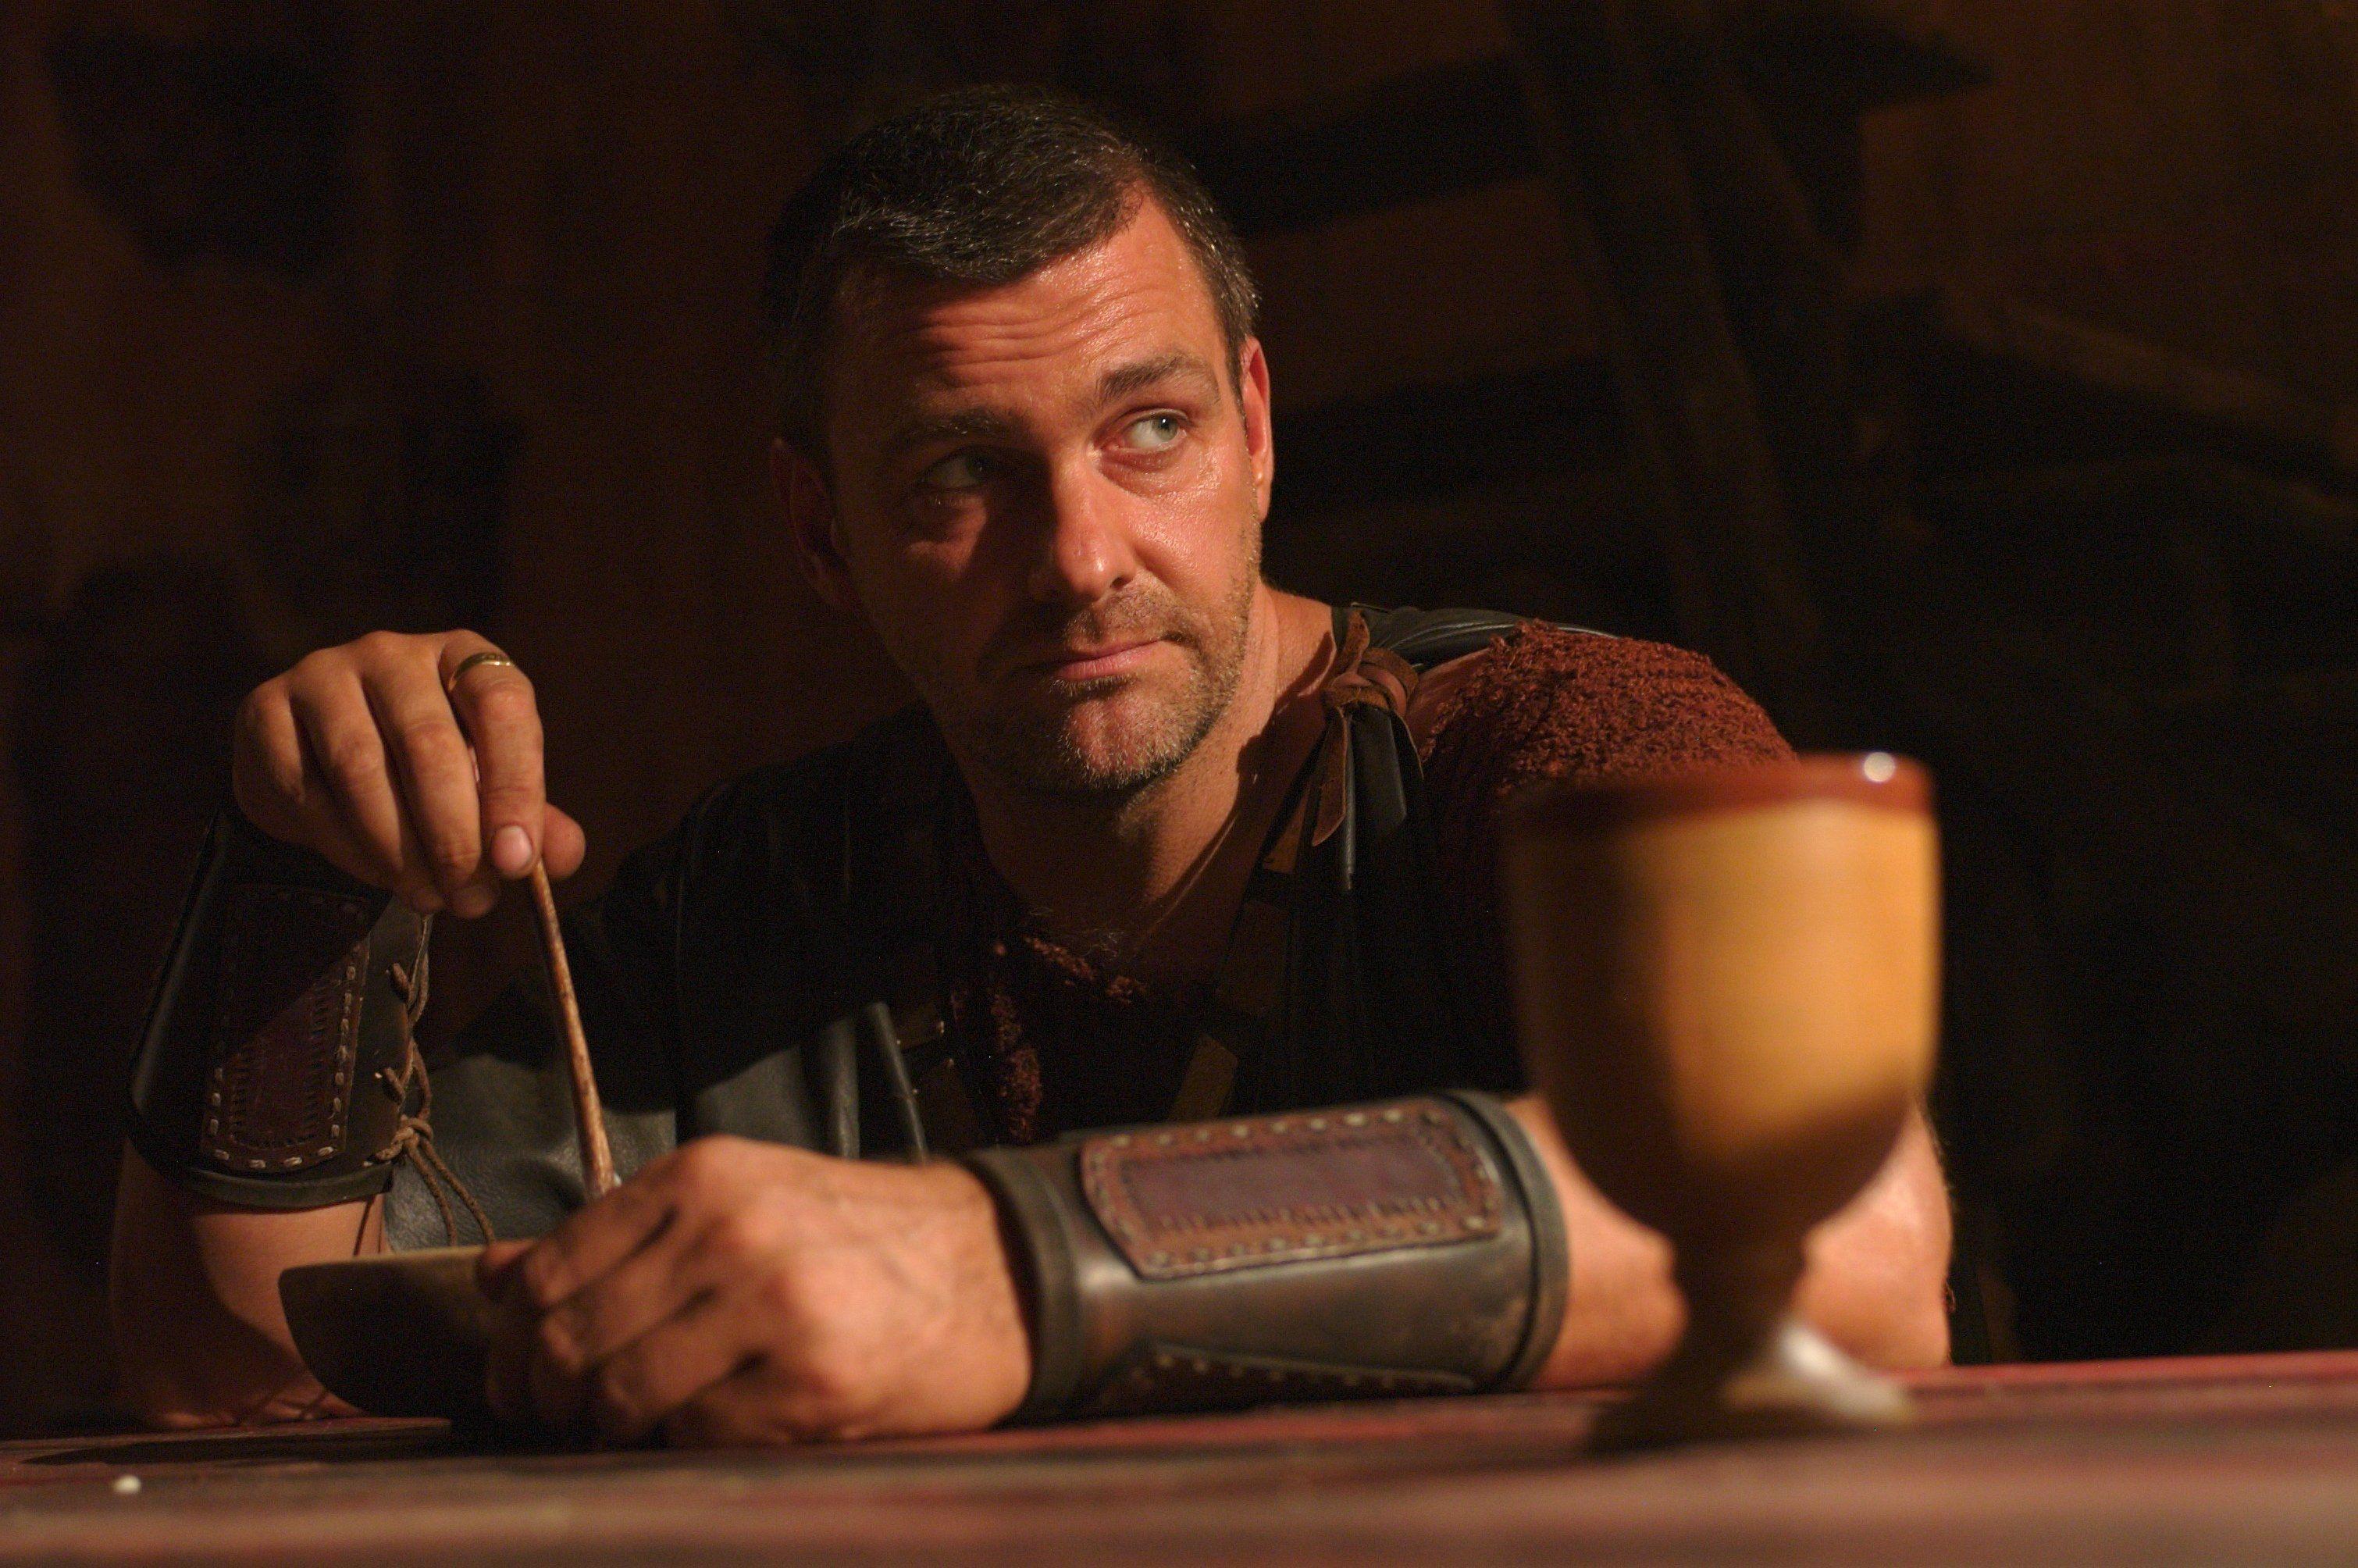 Rome - Titus Pullo | Ray stevenson, Rome tv series, Hbo series